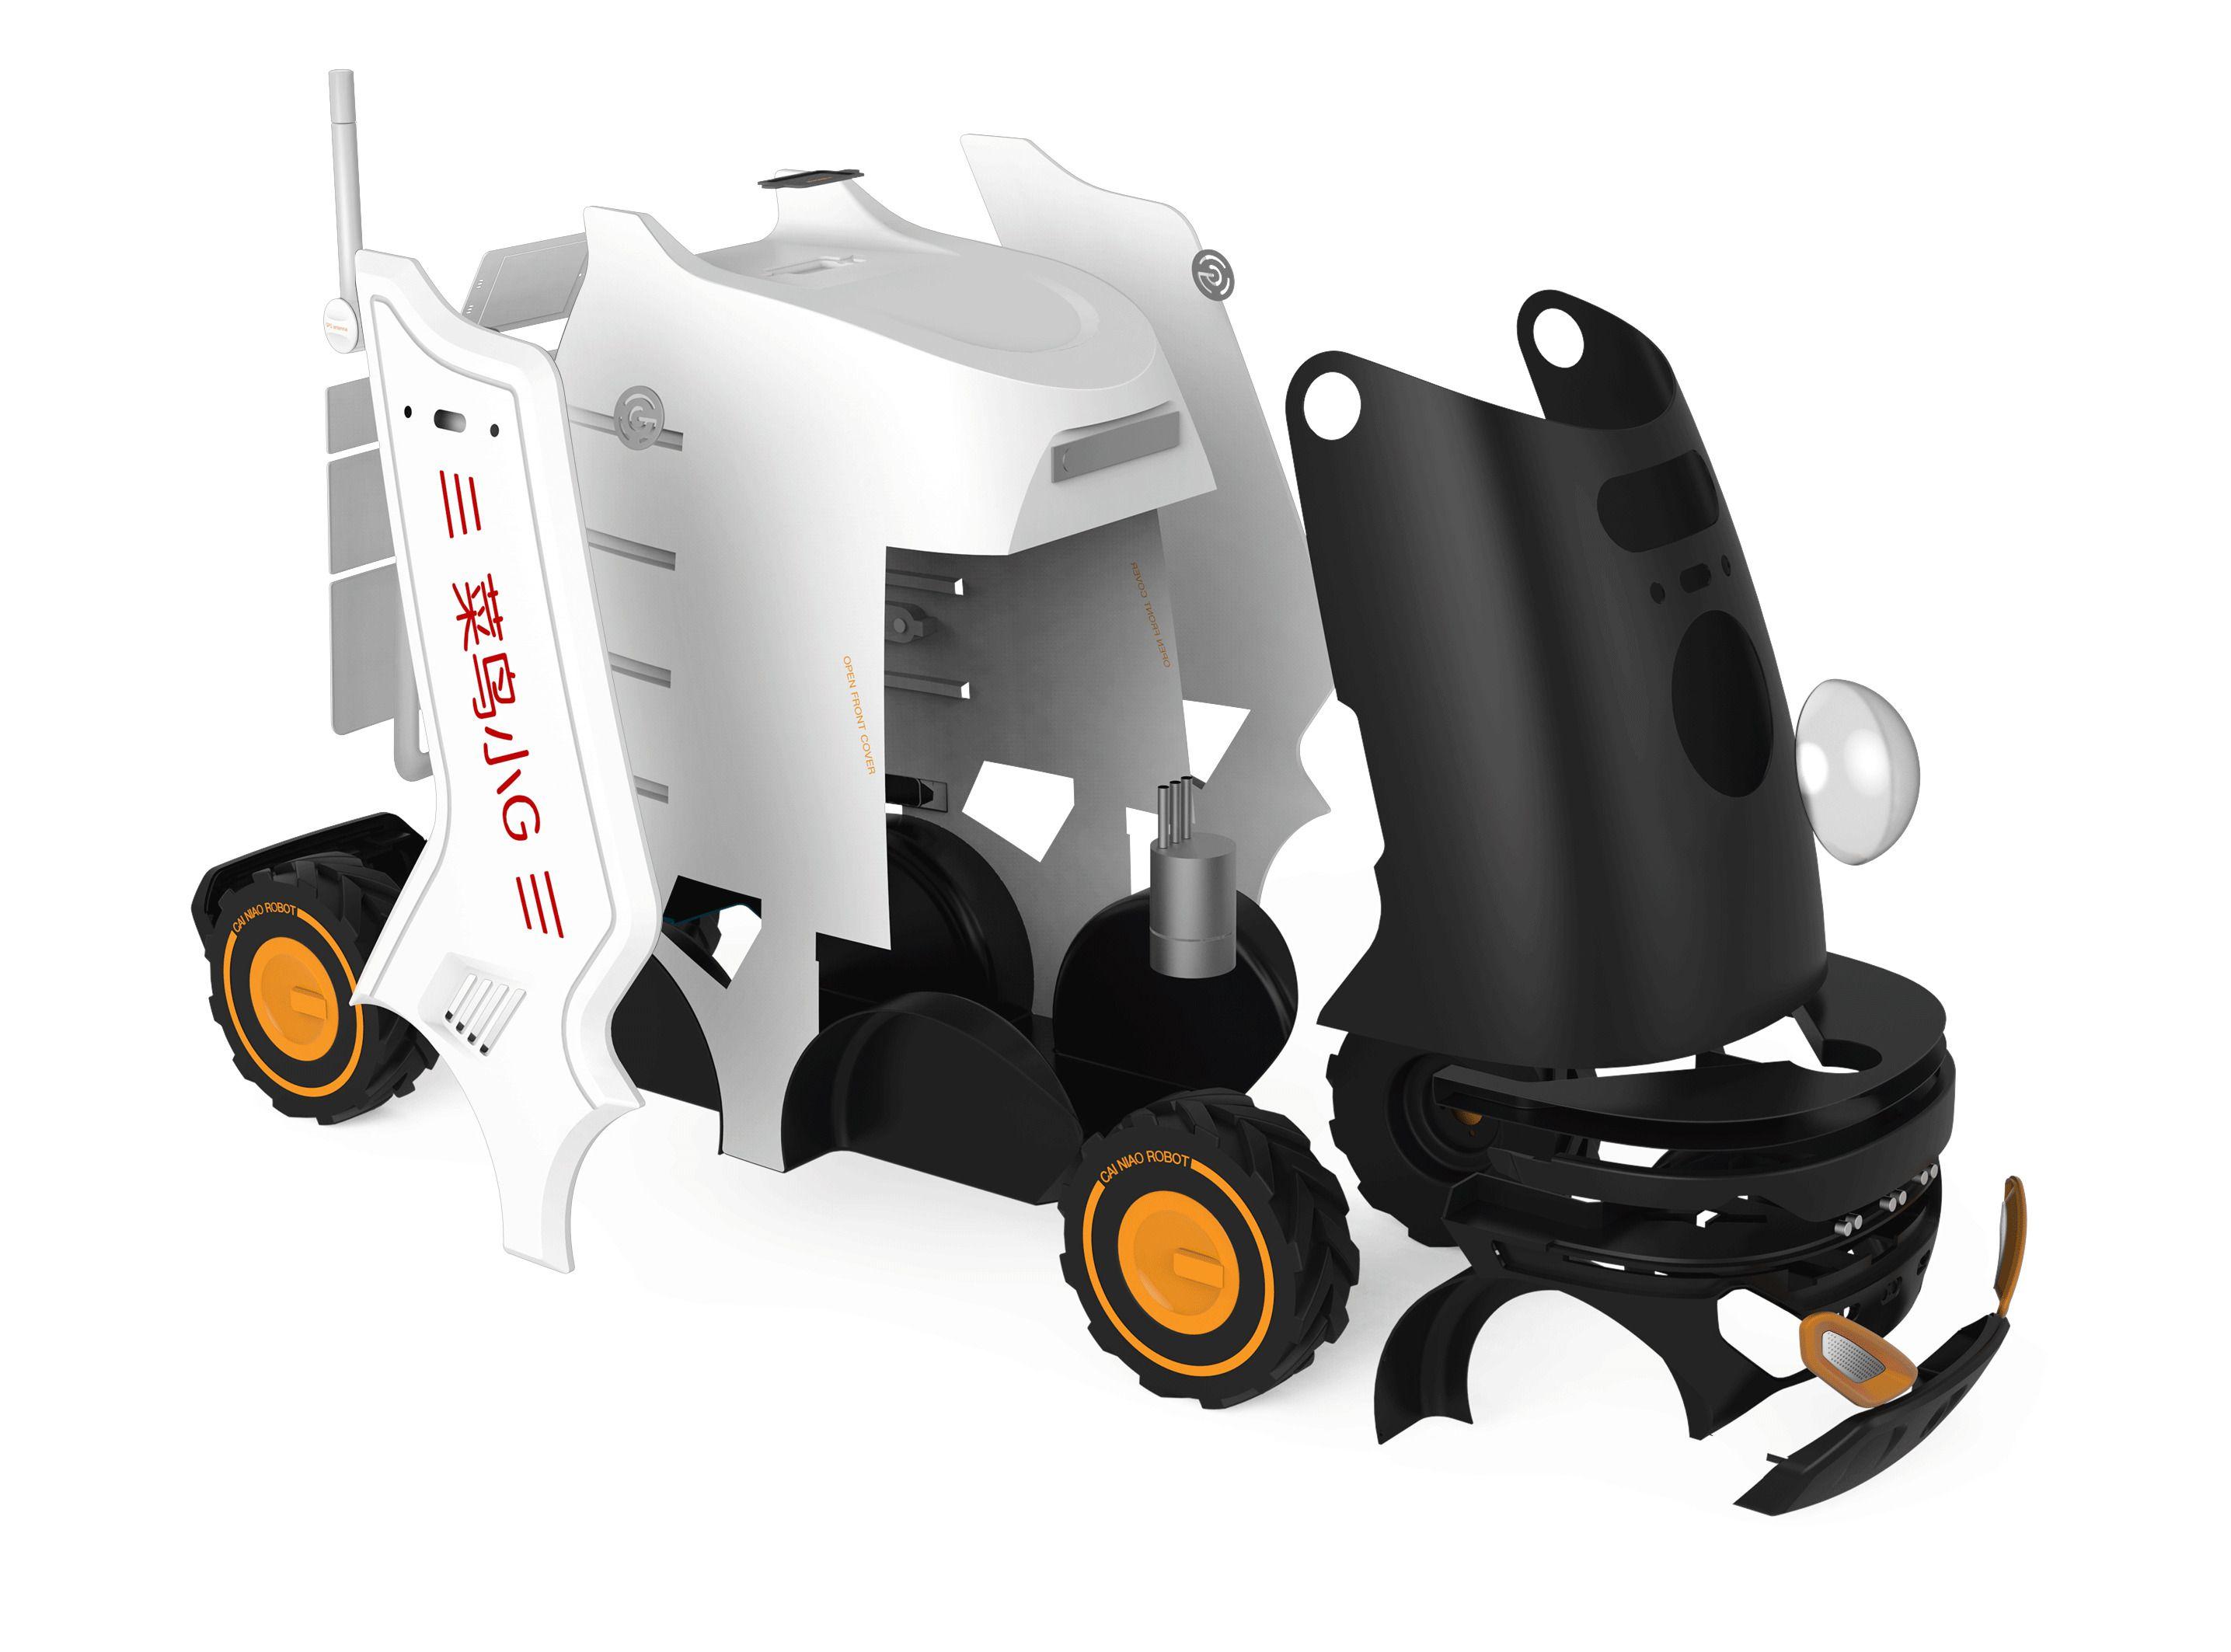 Alibaba Cainiao Networks Artificial Intelligent Autonomous Delivery Robot - Little G (2017)